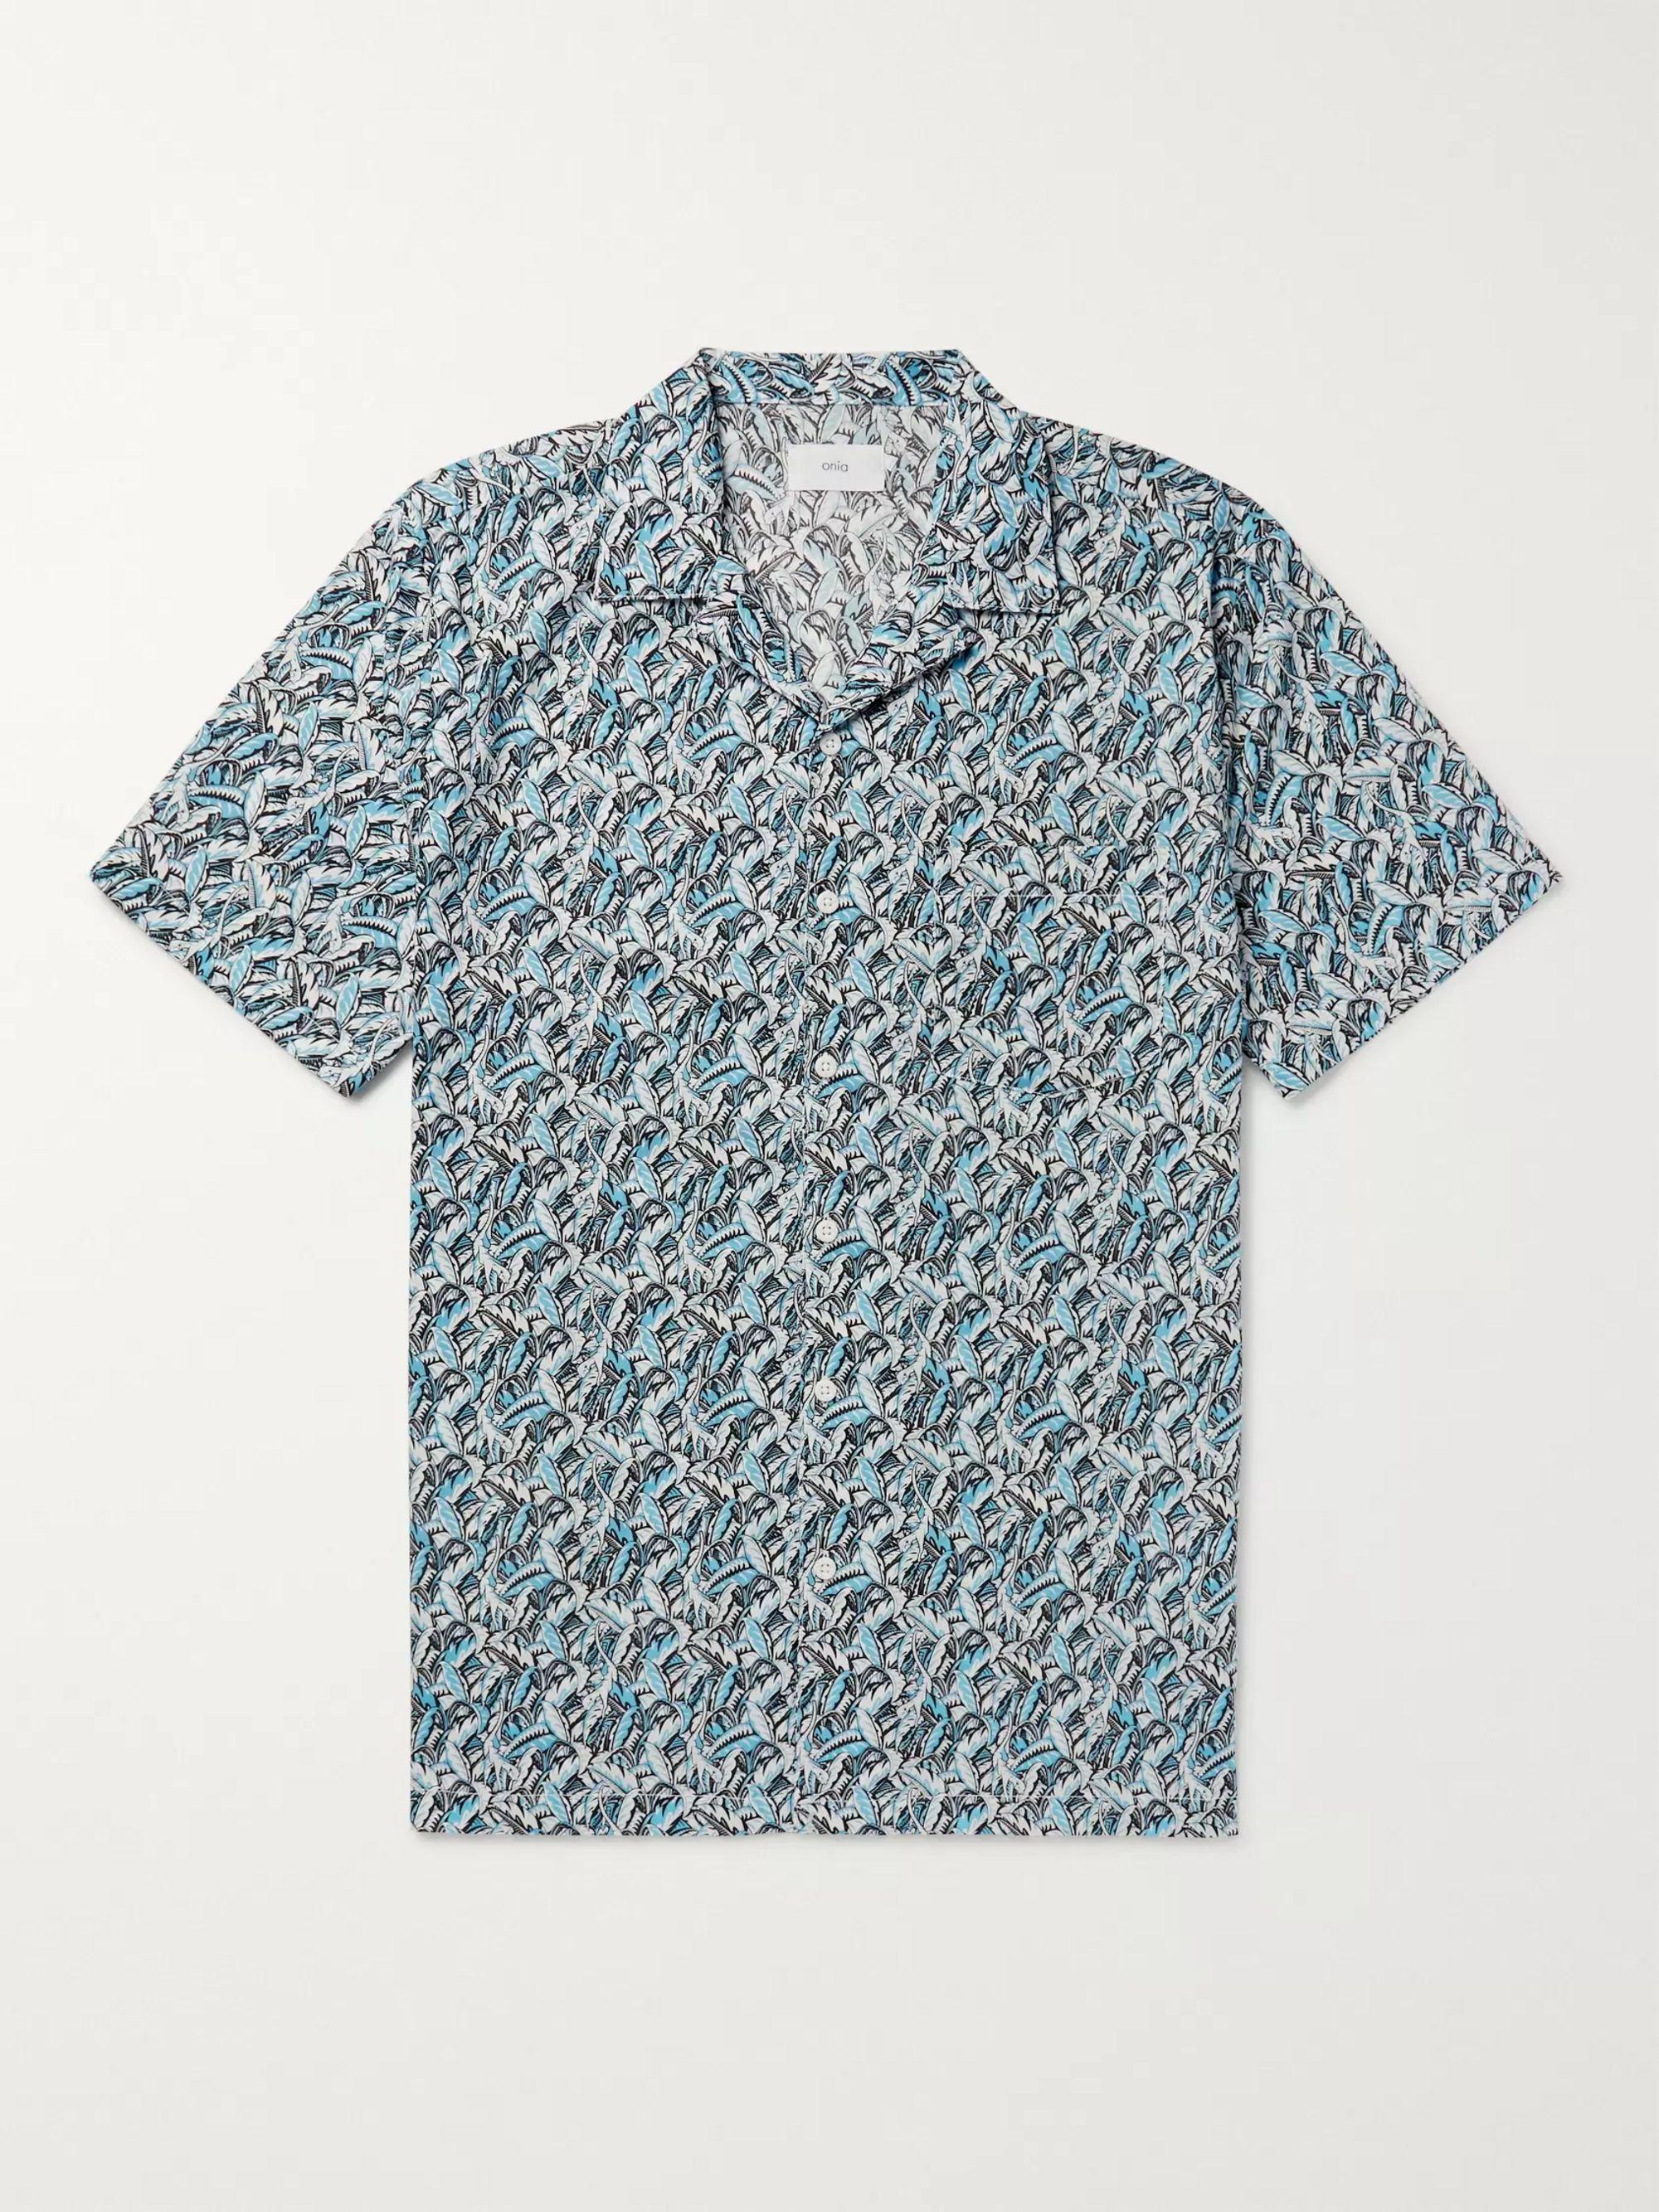 MEN/'S SHIRT SLIM FIT LIBERTY FLORAL VINTAGE PRINTED COTTON LONG SLEEVE GREY BLUE